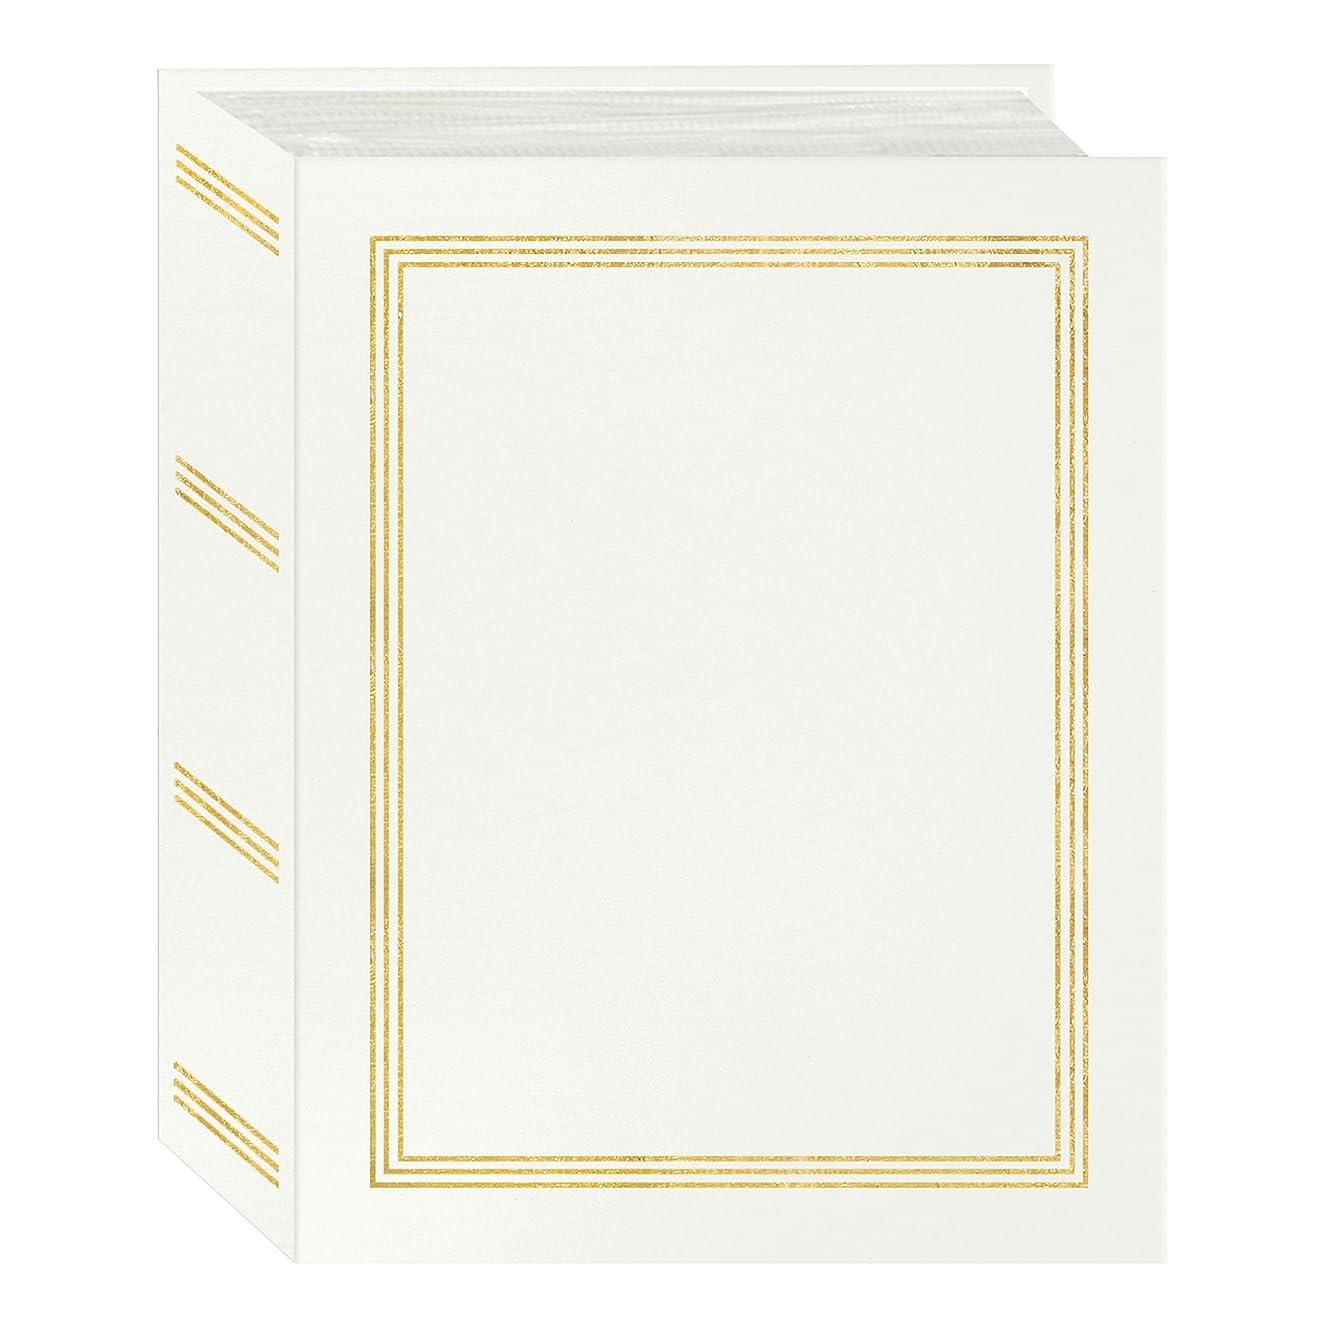 Pioneer Photo Albums A4-100 100 Pocket Mini-Max Album Hold 4x6 Photos, White, 4